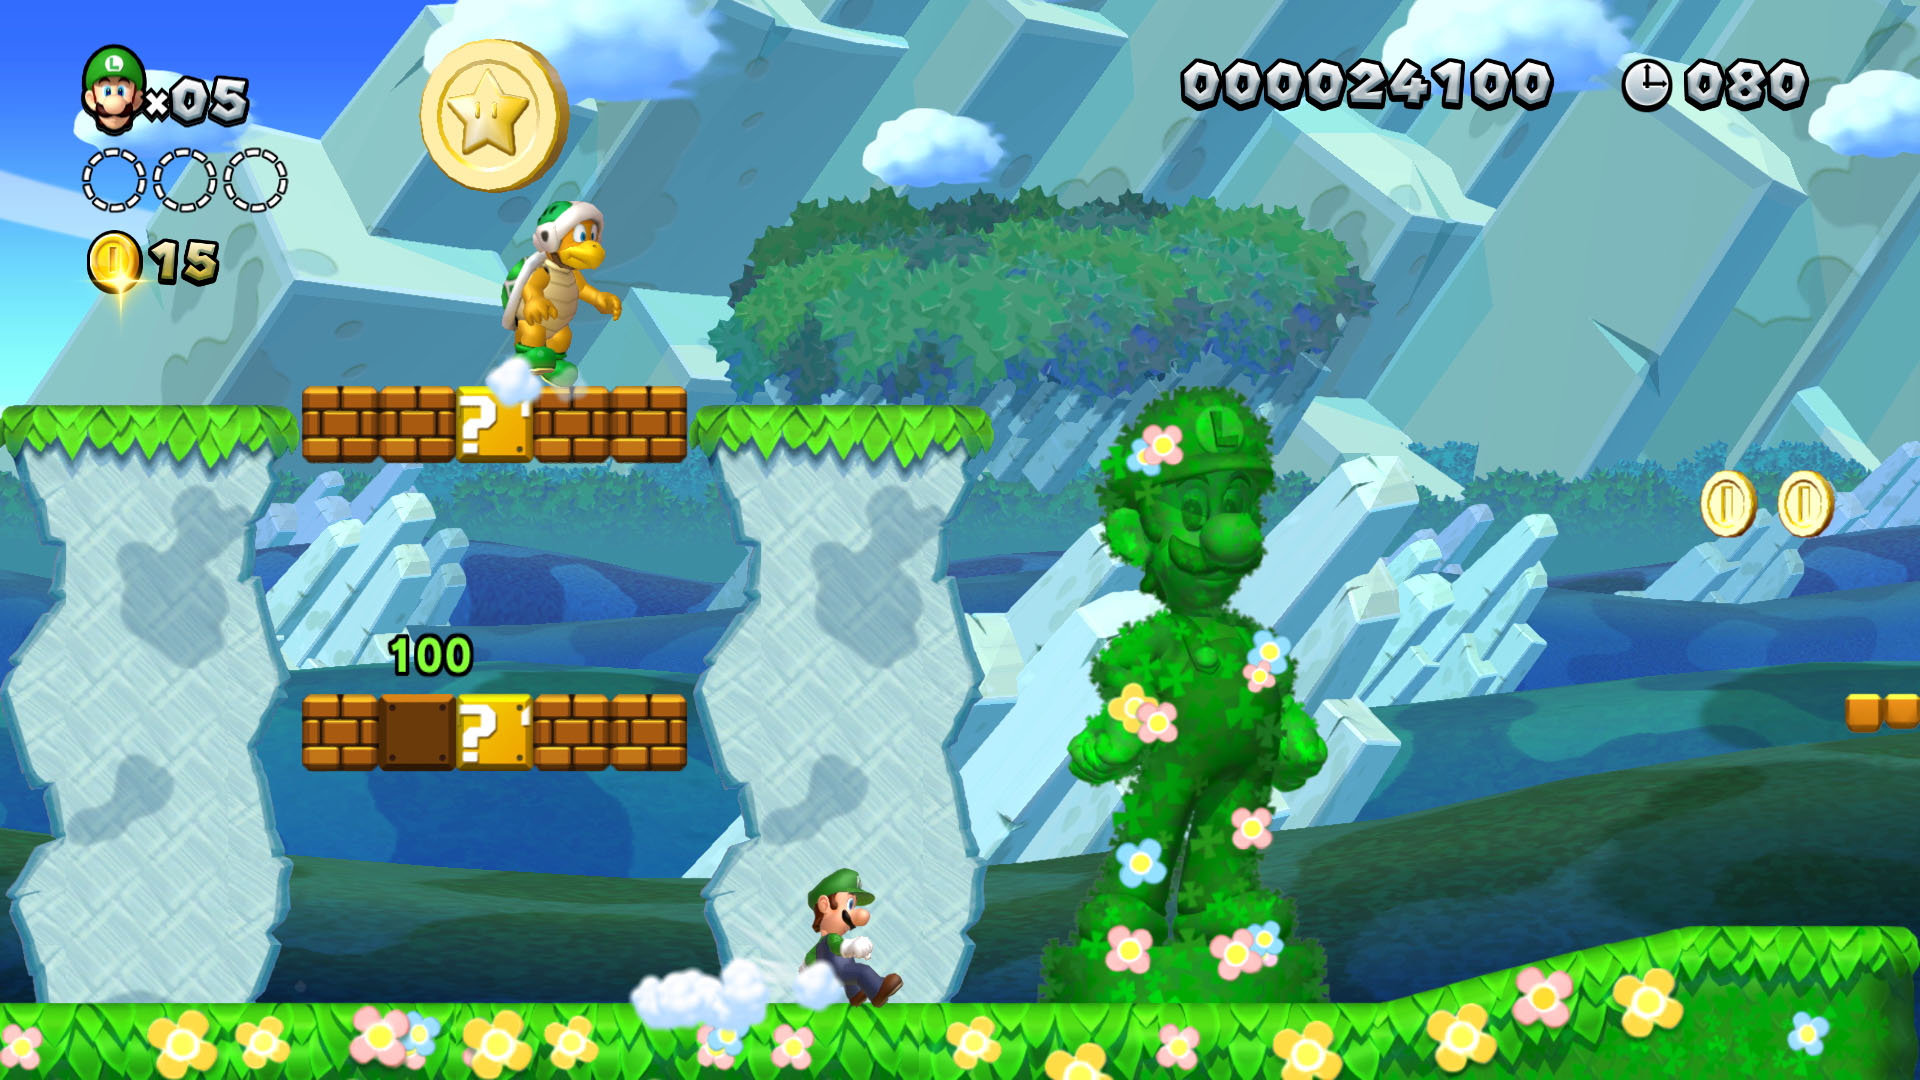 <em>New Super Luigi U</em> è pieno zeppo di easter egg a tema Luigi, e trovarli è uno spasso.